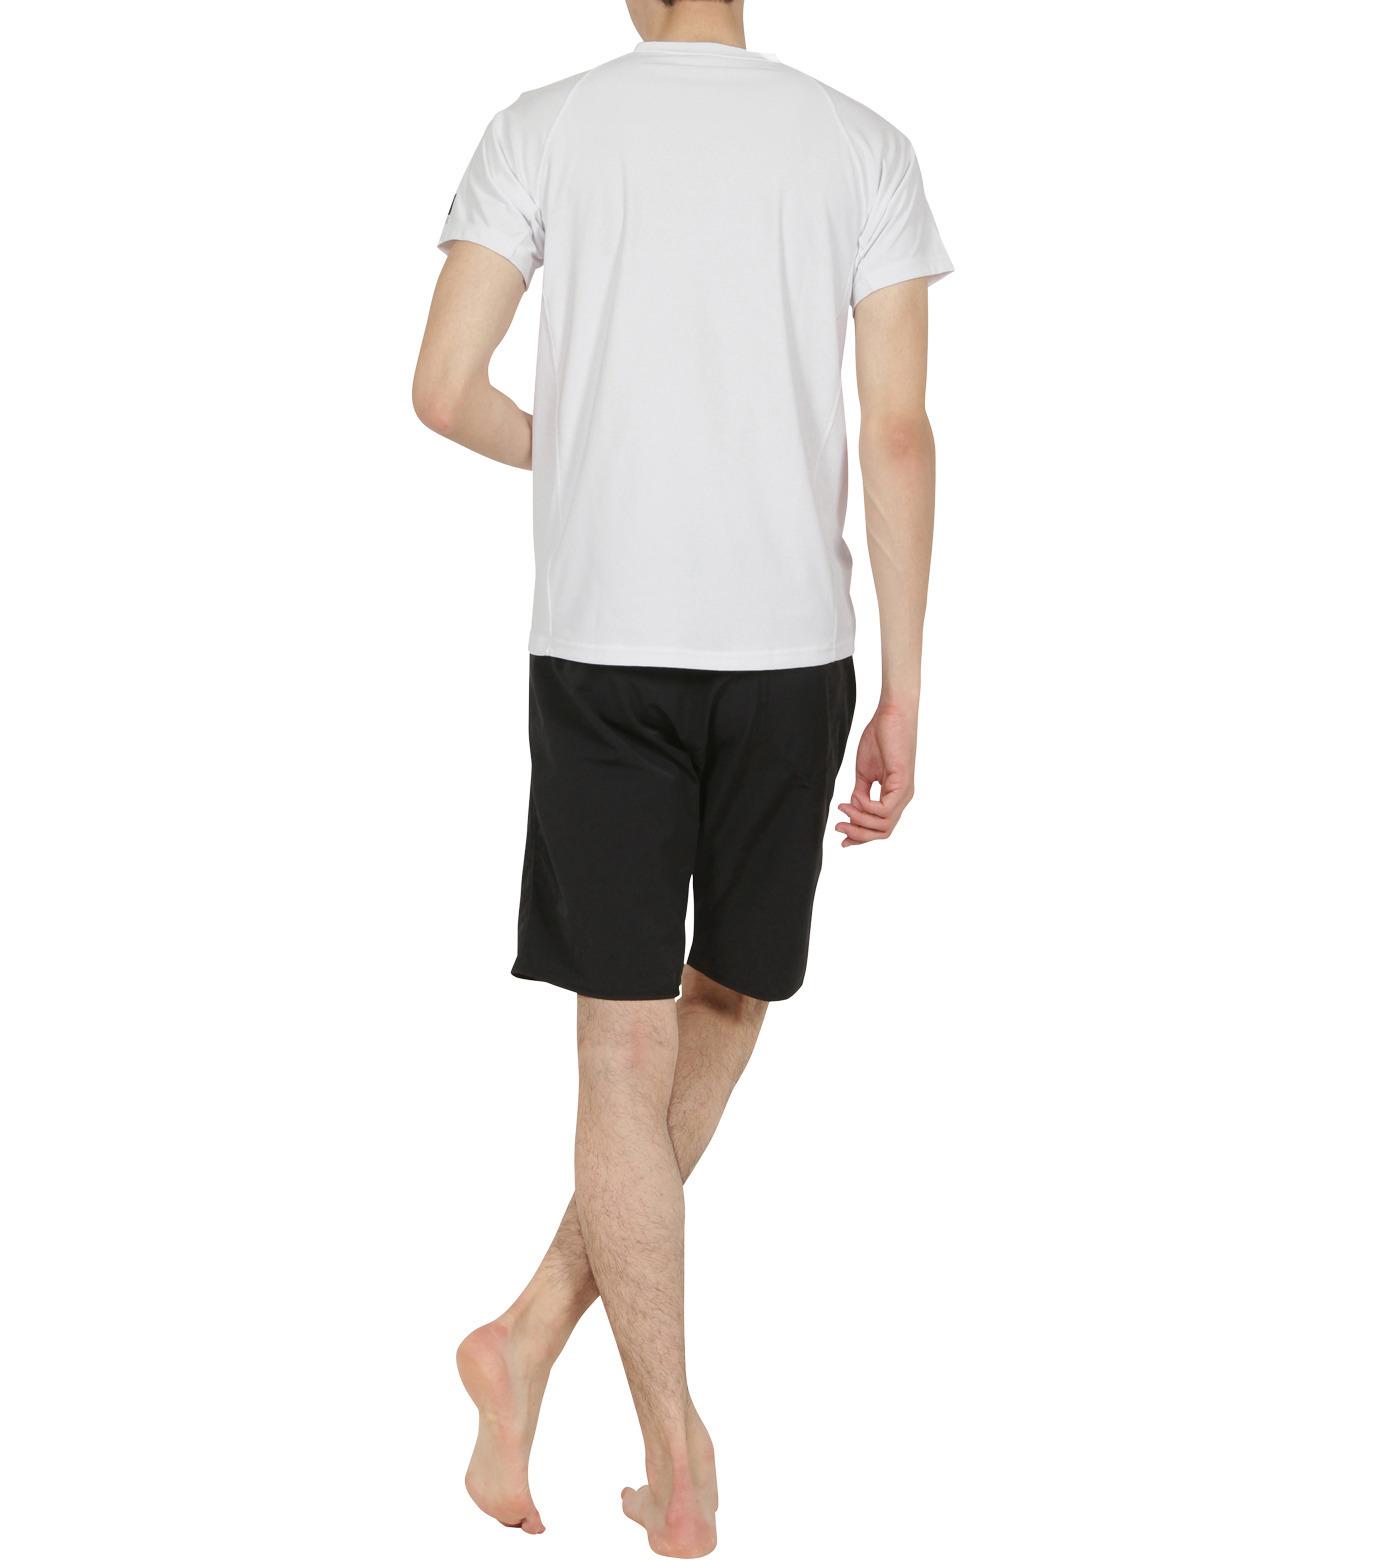 TWO TWO ONE(トゥートゥーワン)のSurf shorts long-WHITE(SWIMWEAR/SWIMWEAR)-15N948002-4 拡大詳細画像4